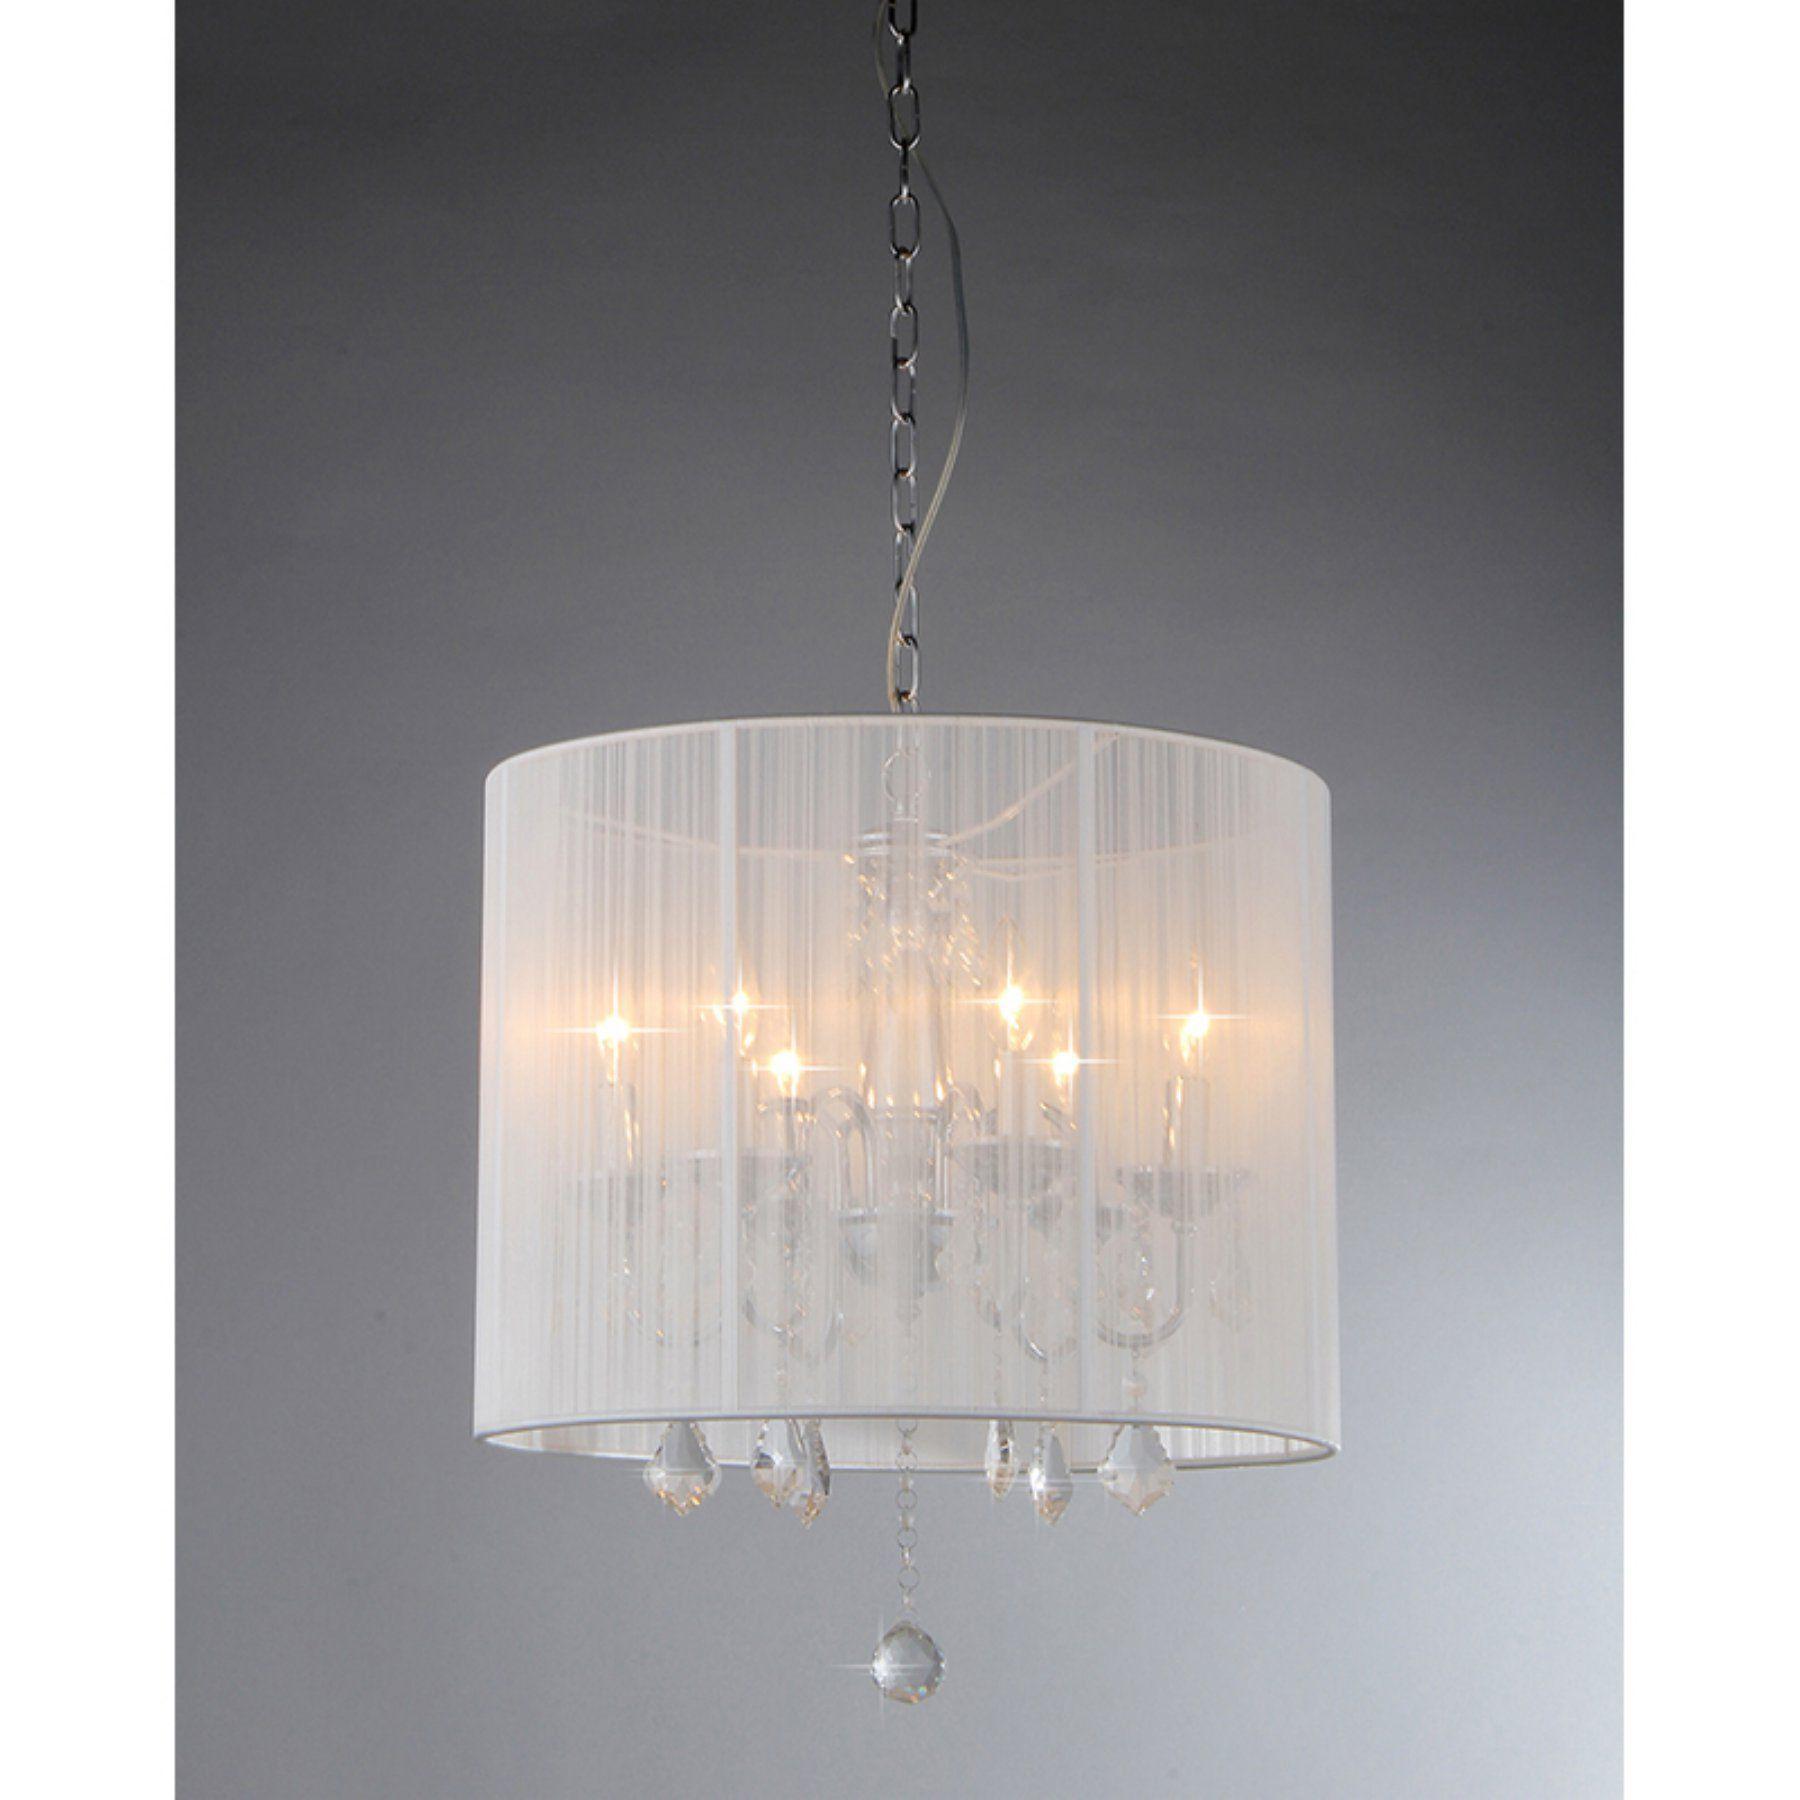 Warehouse Of Tiffany Rl3133 Crystal Chandelier – Rl3133 In Abel 5 Light Drum Chandeliers (Image 28 of 30)